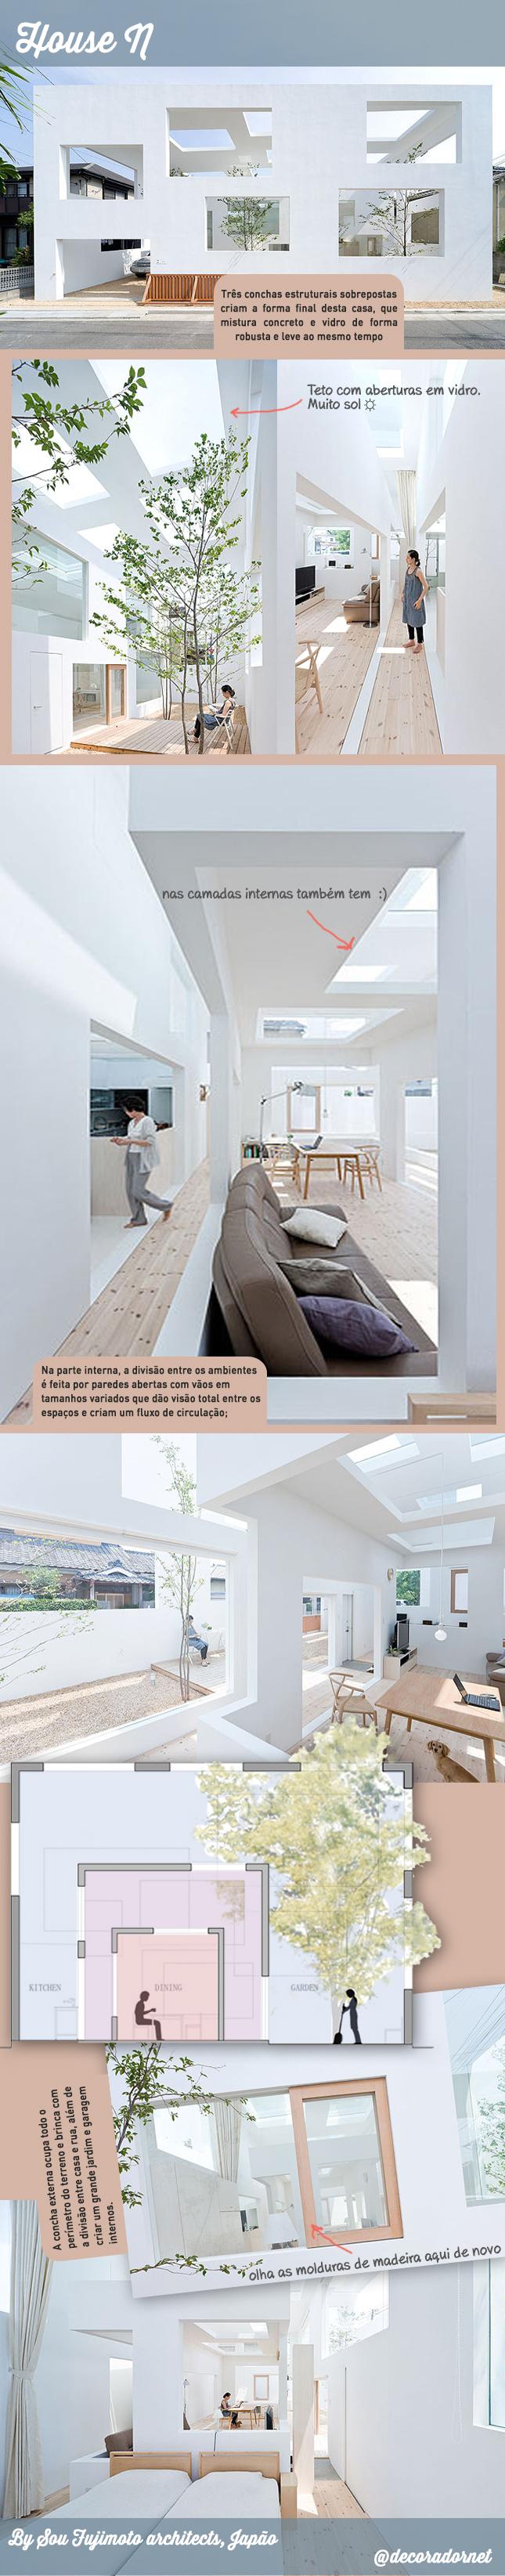 decoradornet-copyright-house-n-sou-fujimoto-10-08-16_03